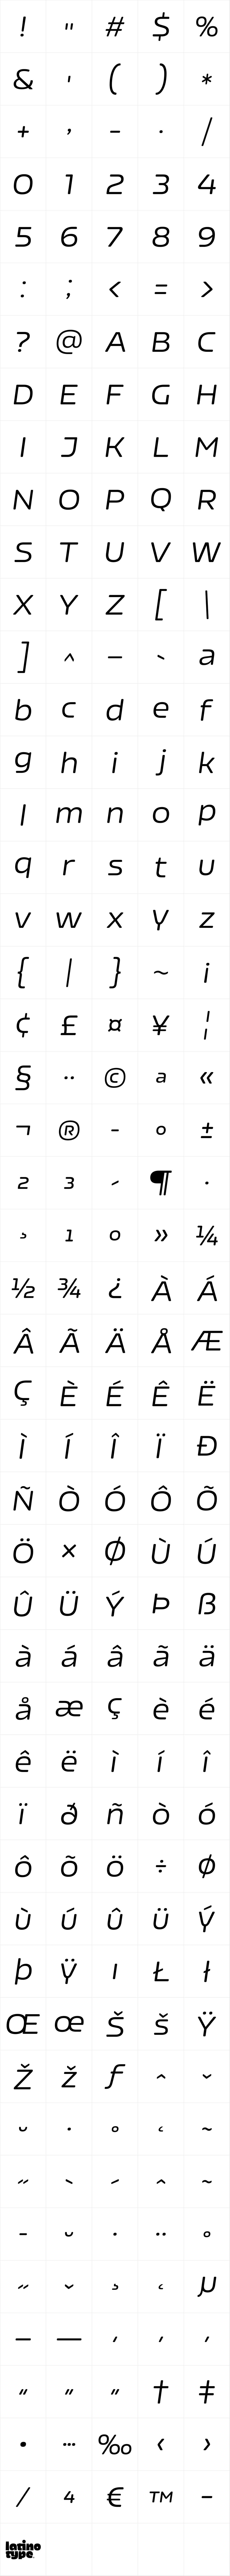 Nizzoli Rounded Regular Italic